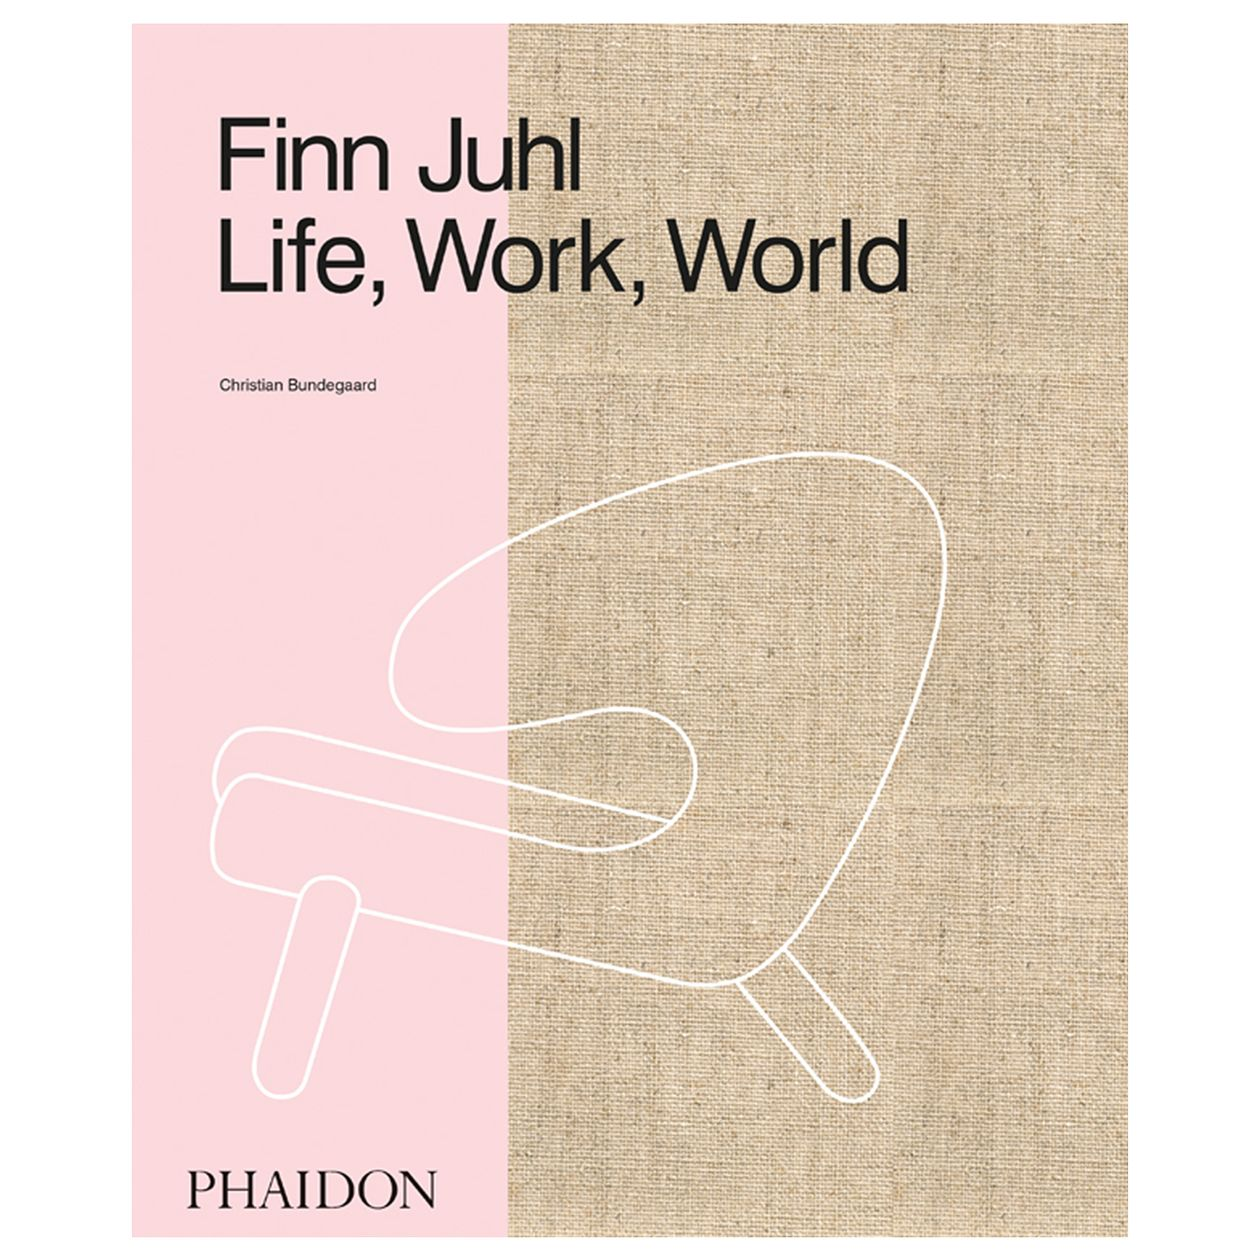 Finn Juhl: Life, Work, World